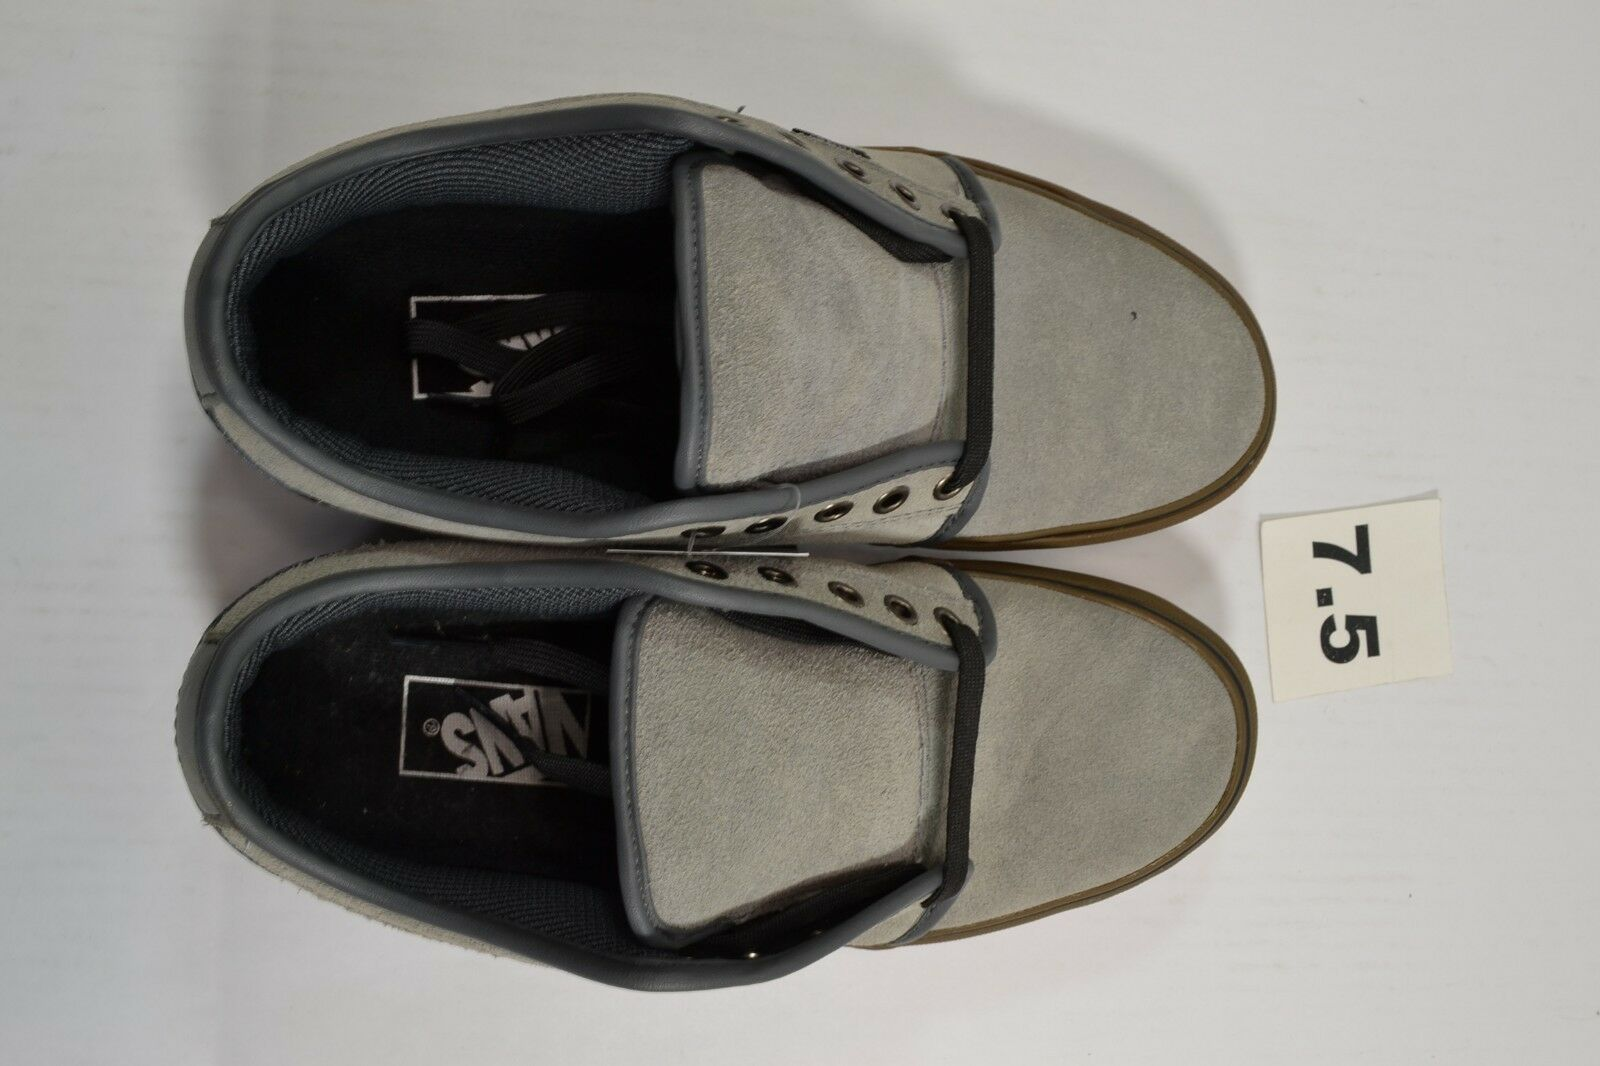 Vans CHUKKA LOW CHRIS (355) PFANNER Gris Gum Discounted (355) CHRIS Hombre Skate Zapatos b90148